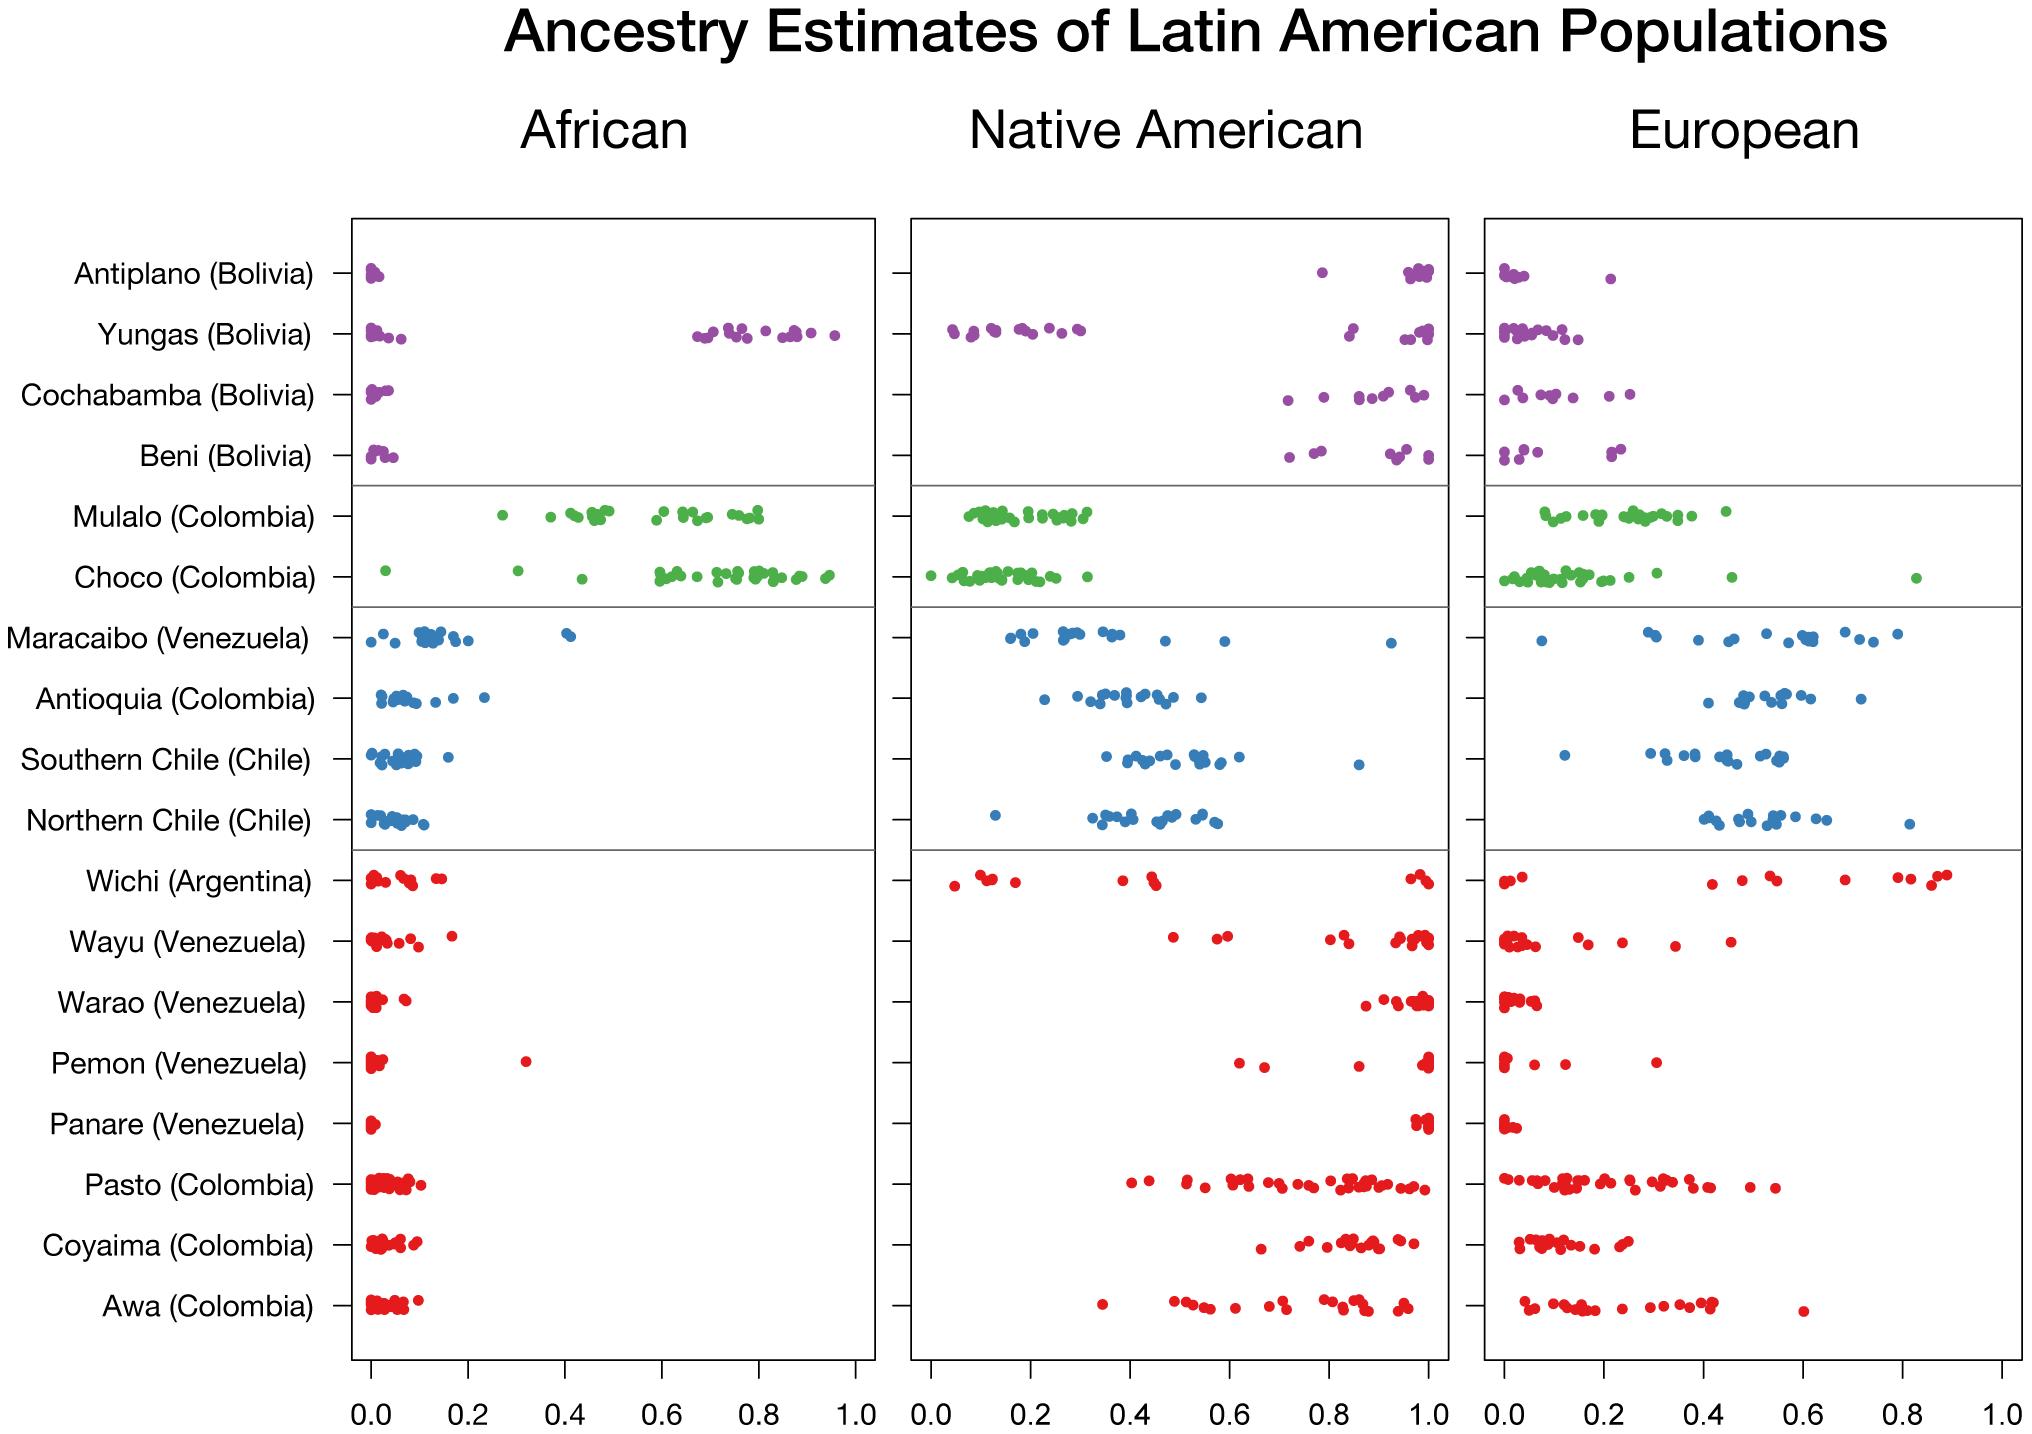 Ancestry estimates of Latin American populations.